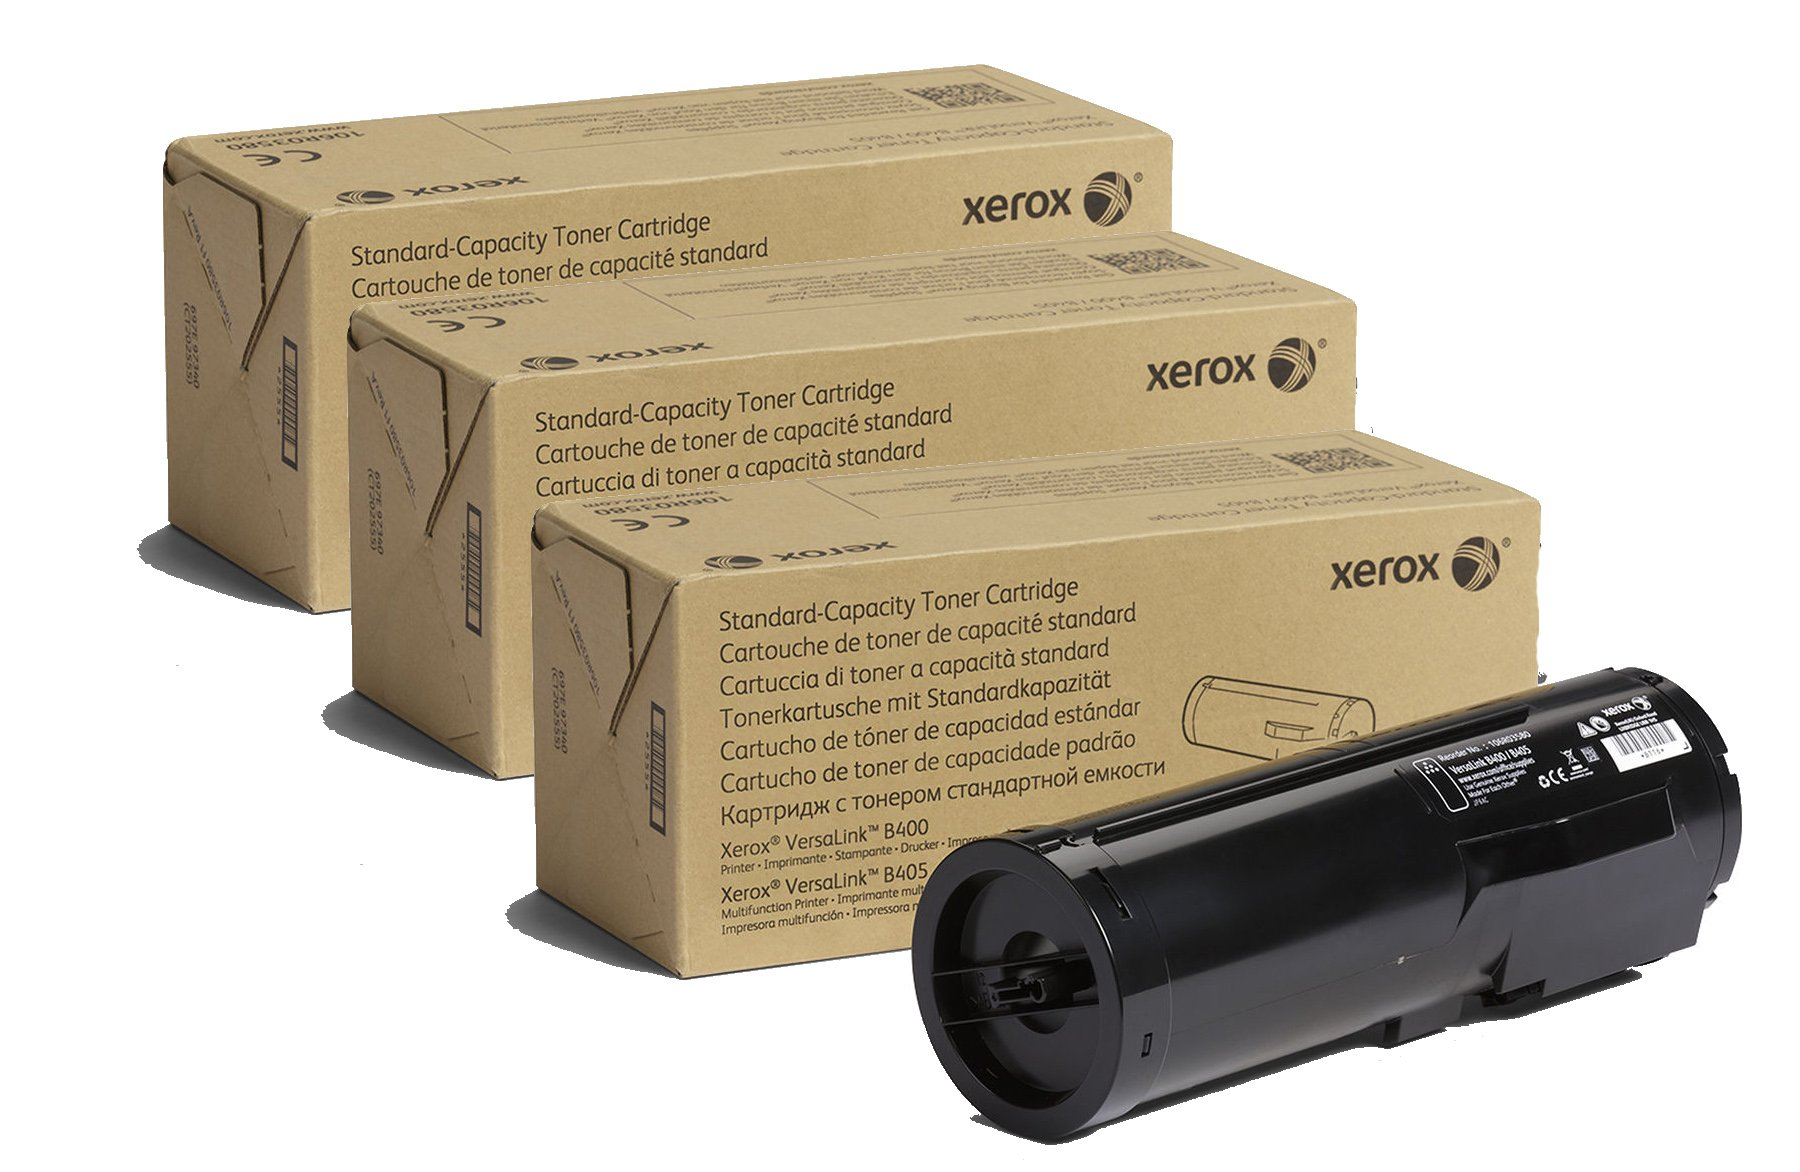 Toner Original XEROX106R03580 Black Standard Capacidad – 5900 Páginas para Usar con VersaLink B400/B405 – 3 Pack